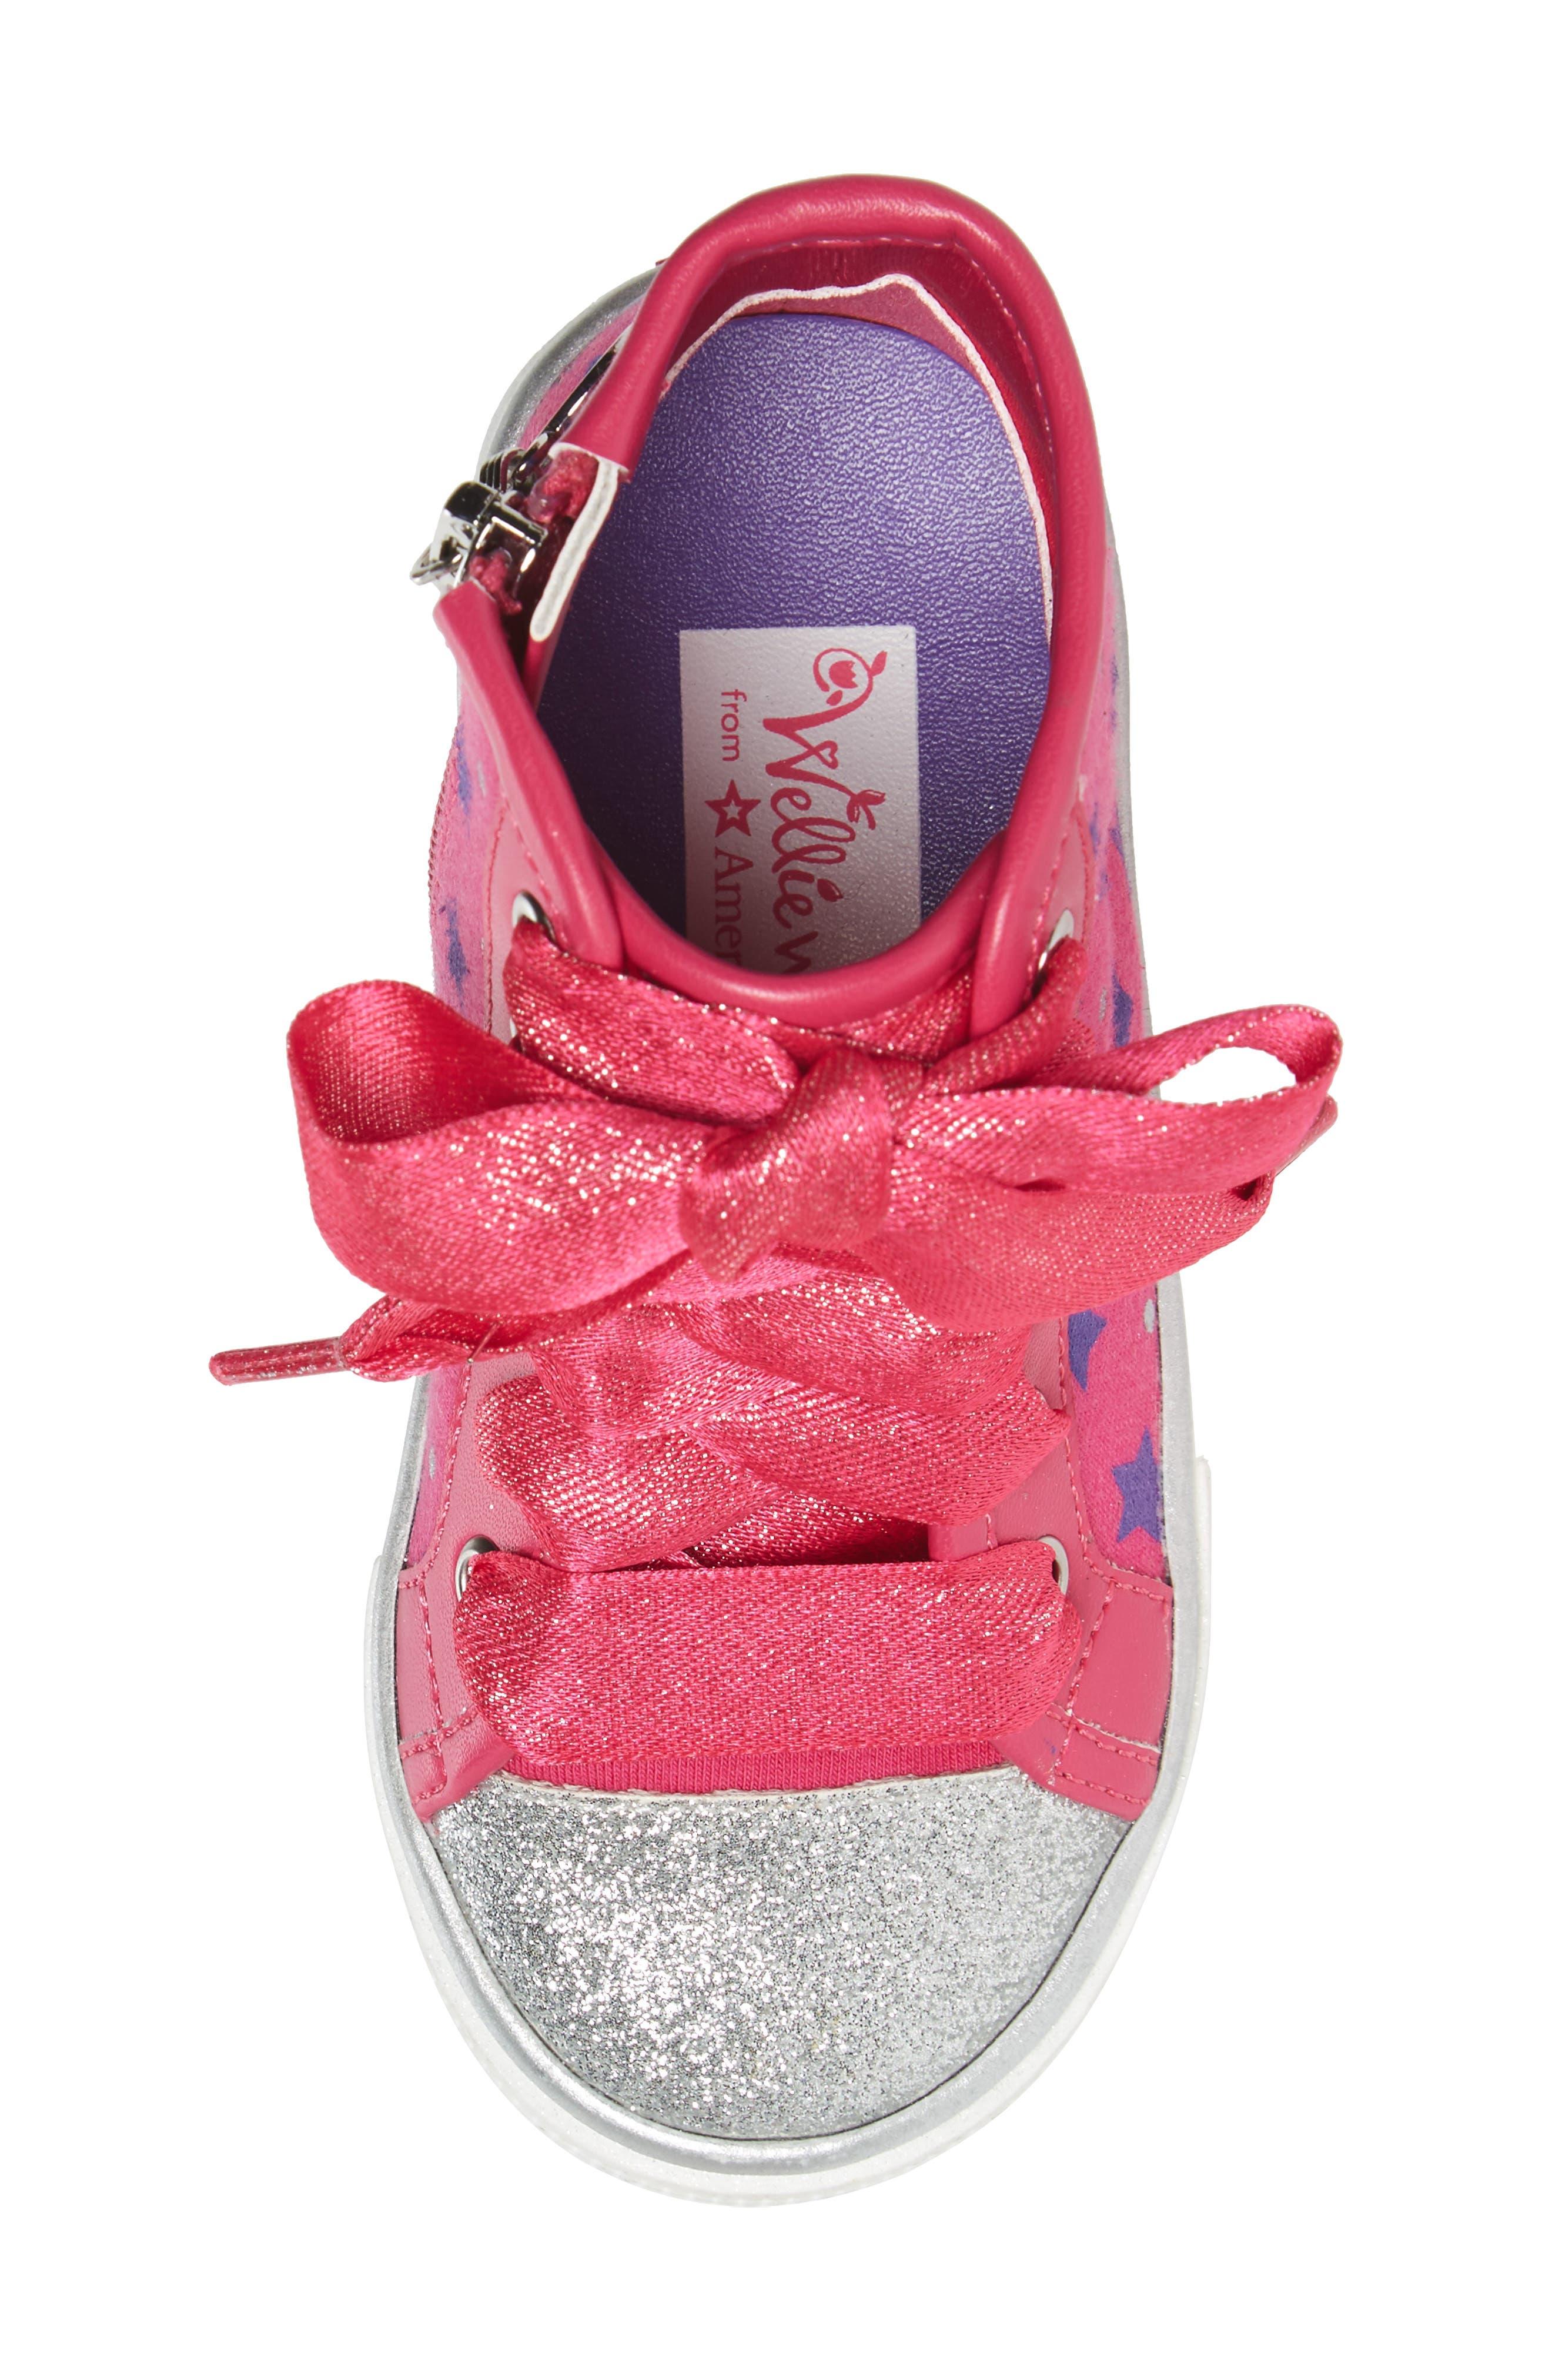 Emerson High Top Sneaker,                             Alternate thumbnail 5, color,                             Pink/ Purple